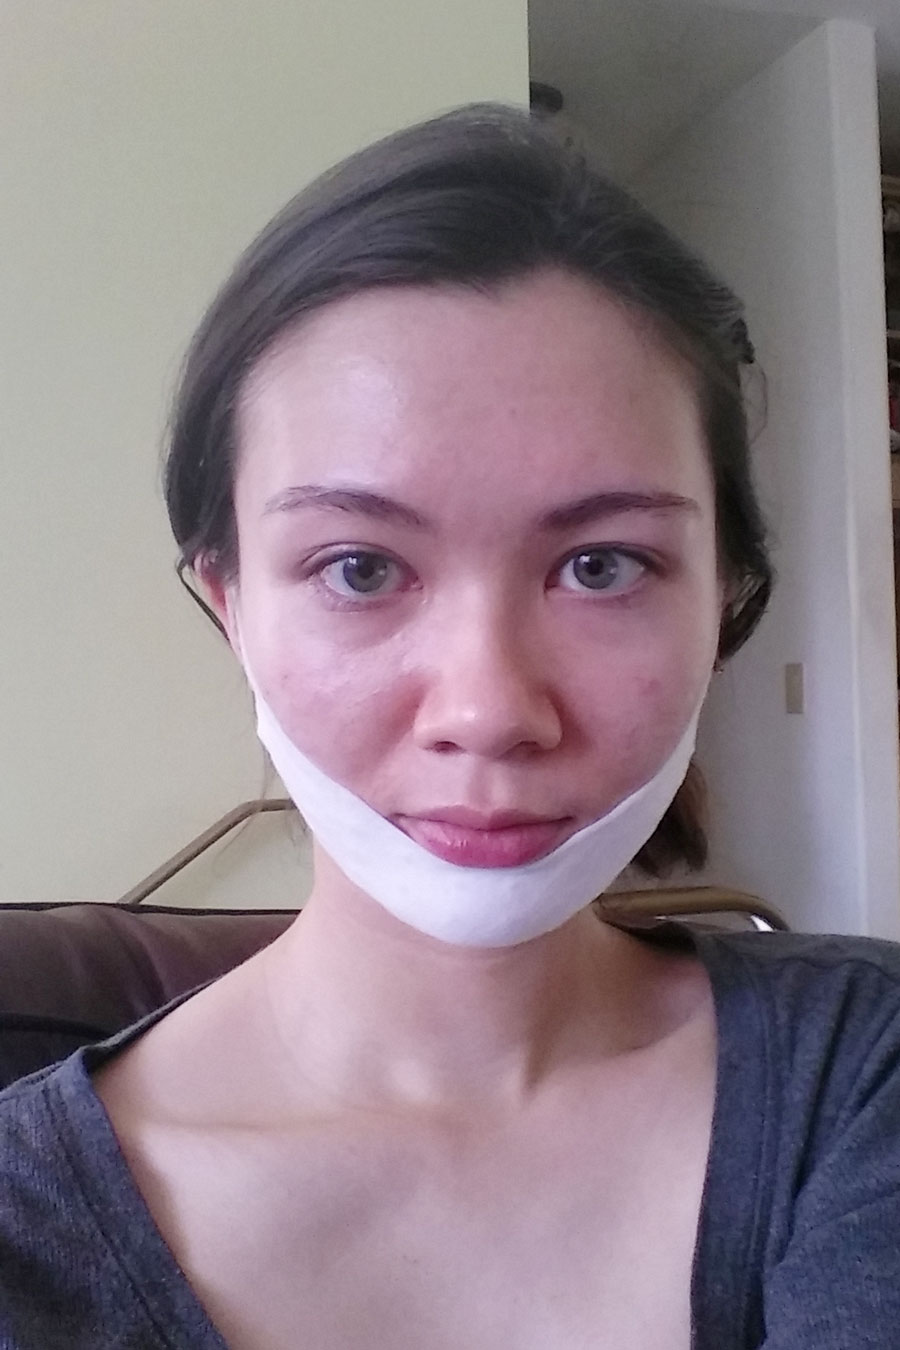 The Face Shop, Sharp Modelling Gel Patch, slimmer face, slimming patch, skincare, korean skincare, beauty